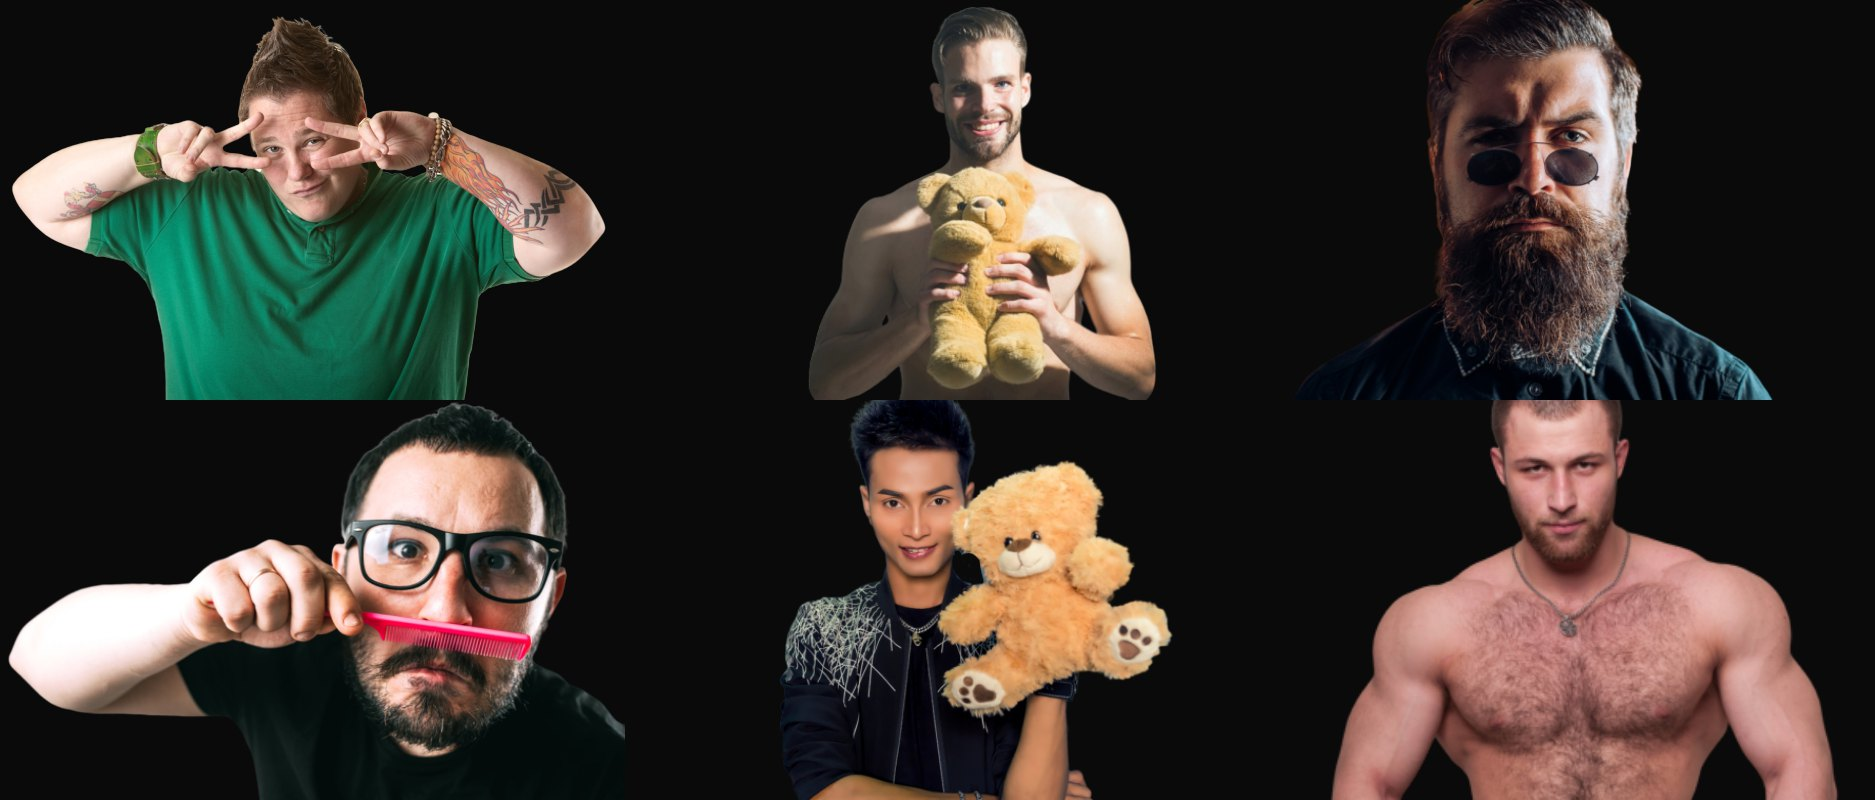 clases de osos gays